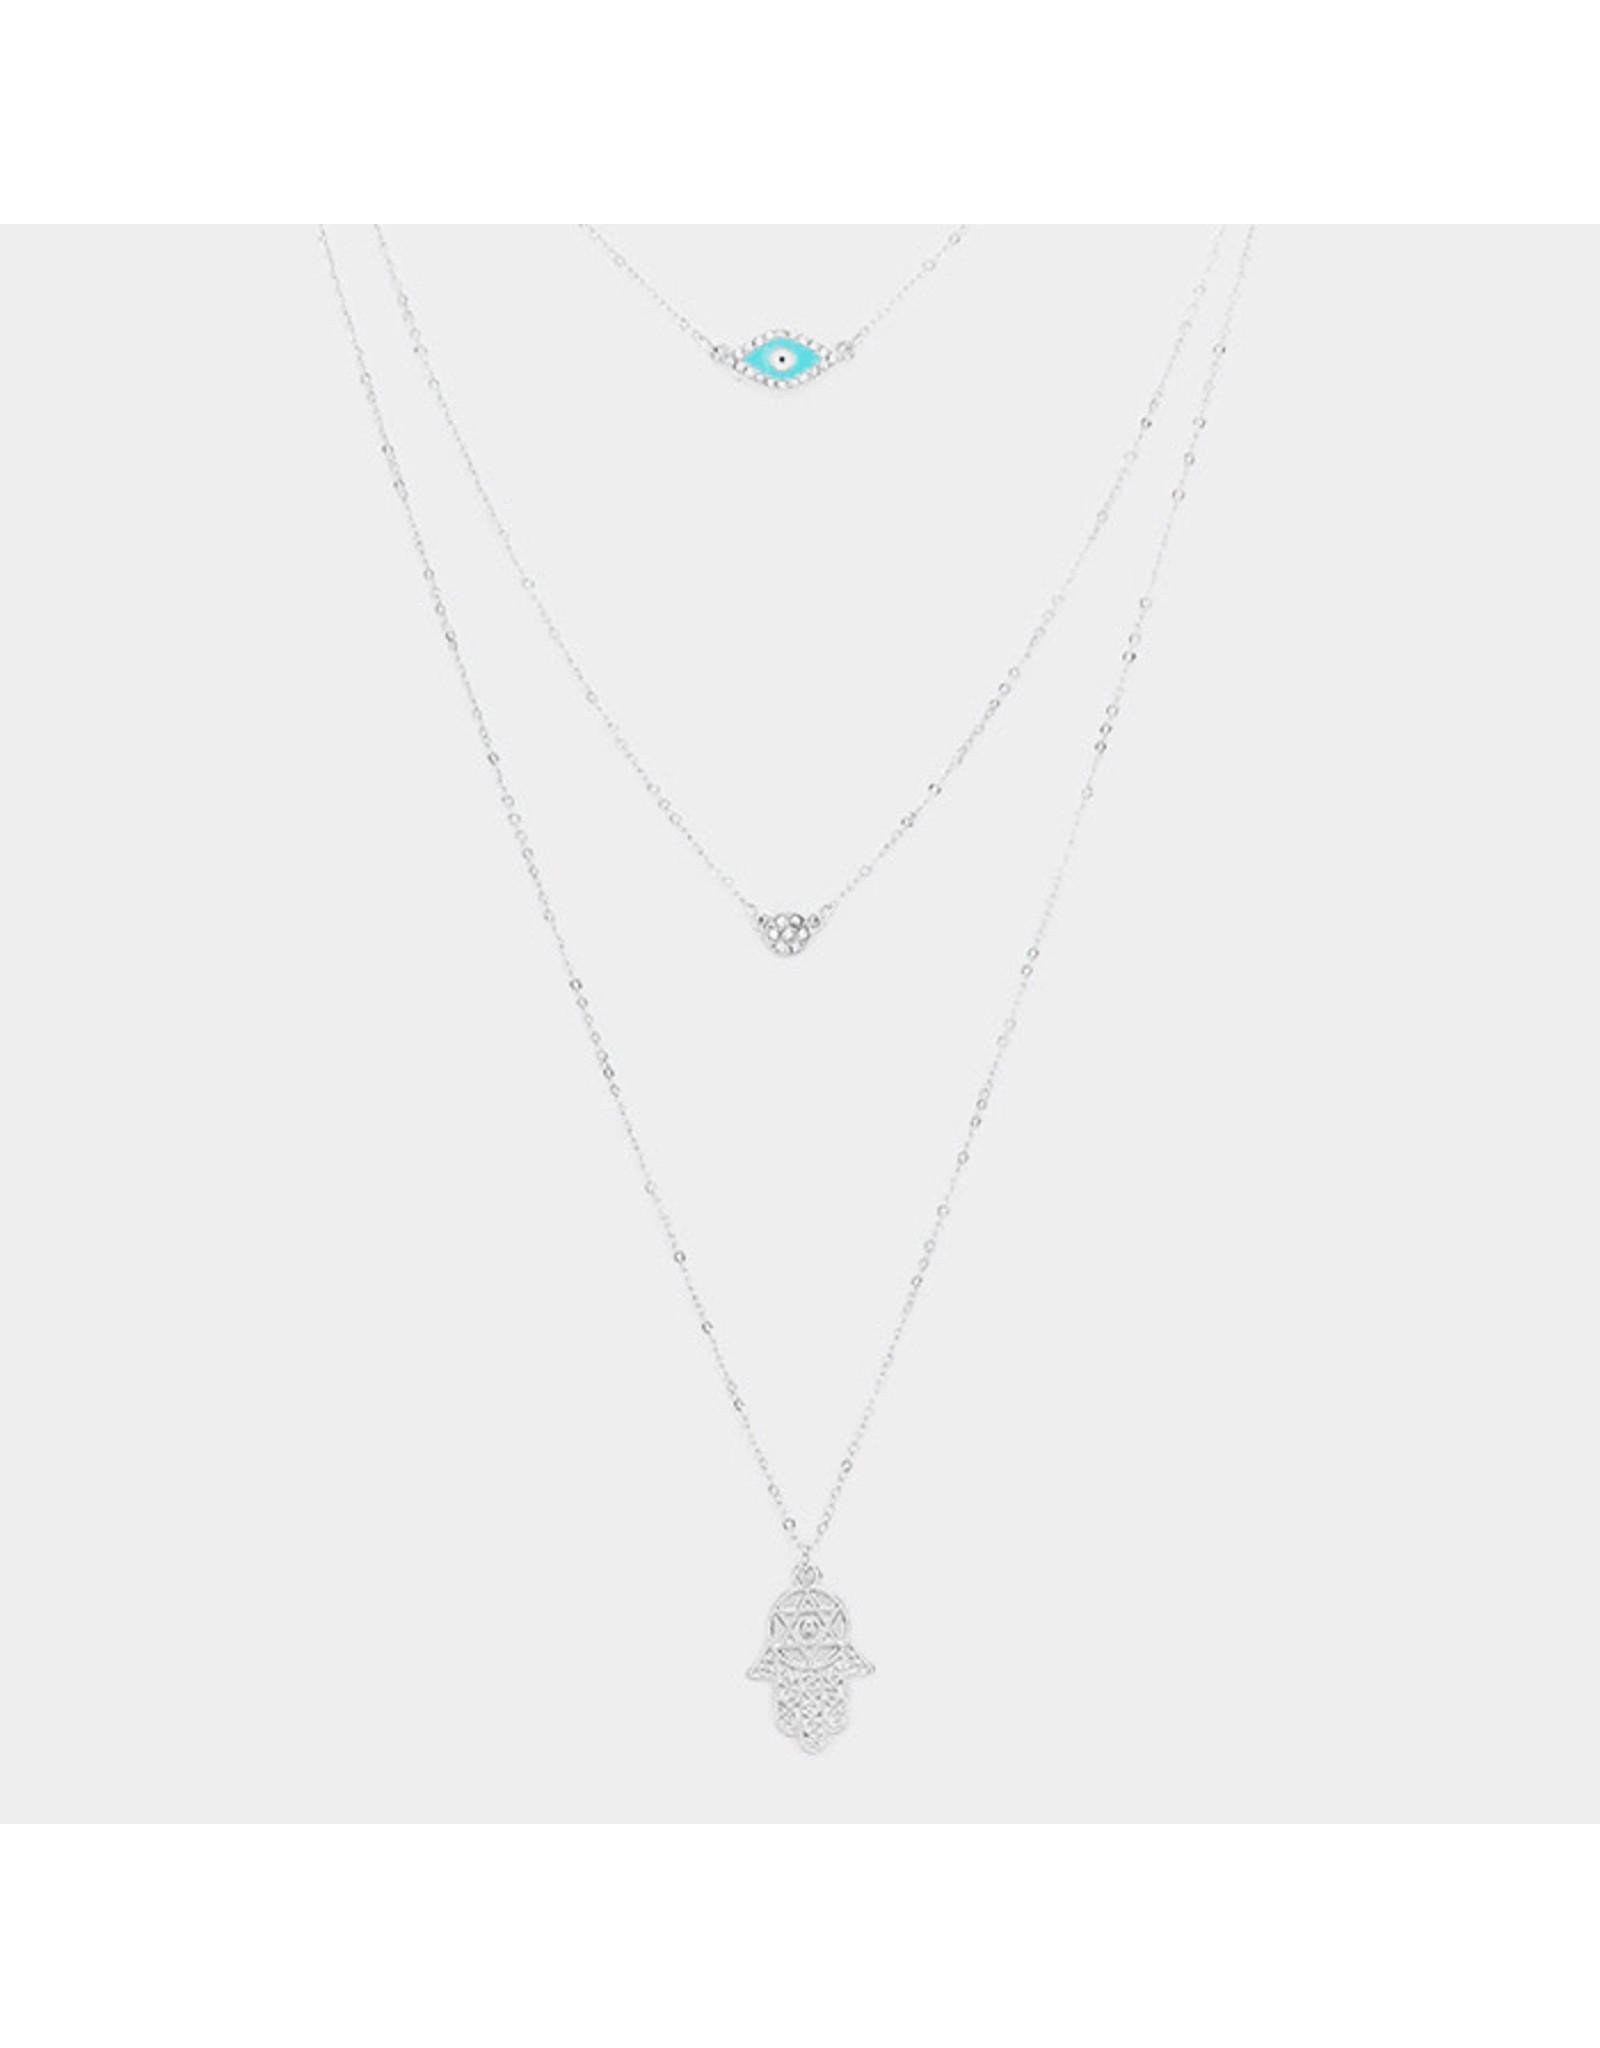 Triple Hamsa Long Necklace